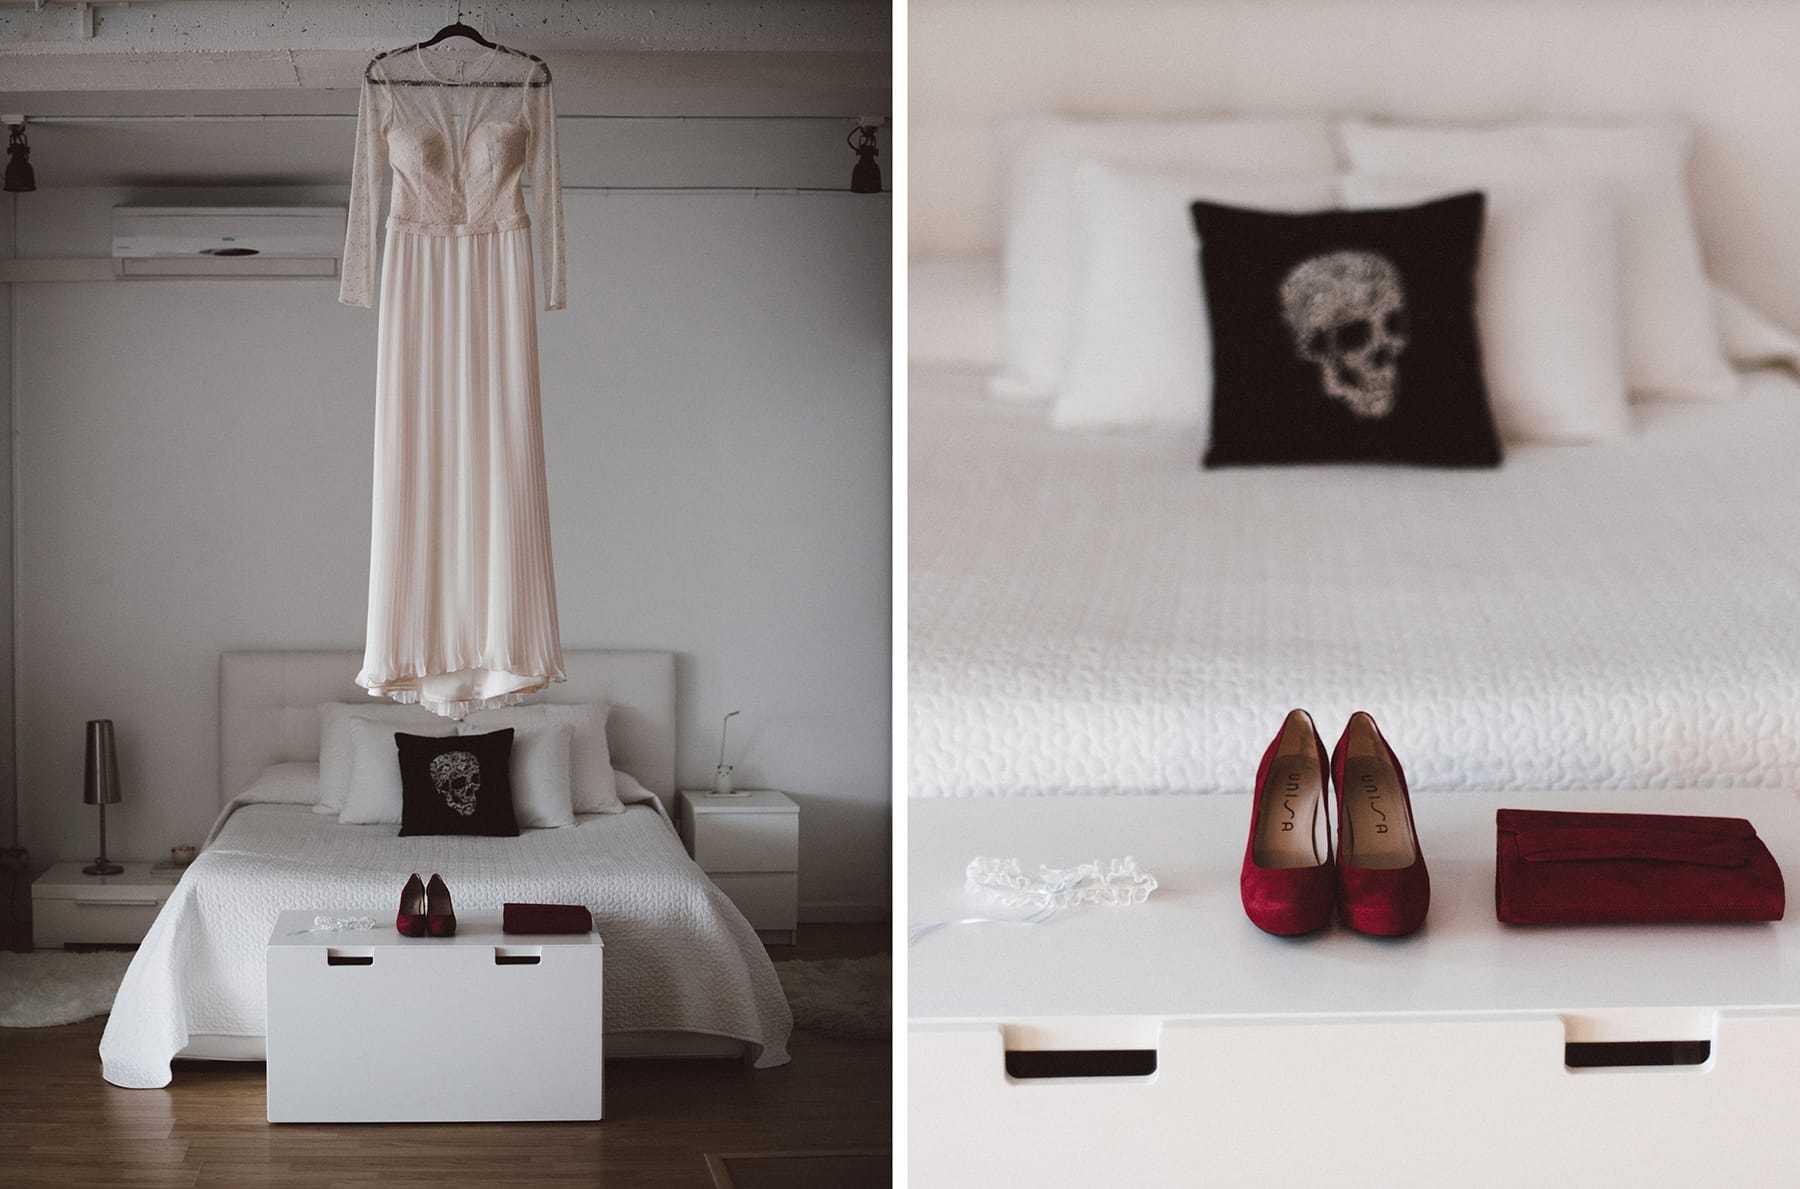 vestido_de_novia_otaduy_hilario_sanchez_fotografo_boda_barcelona_028